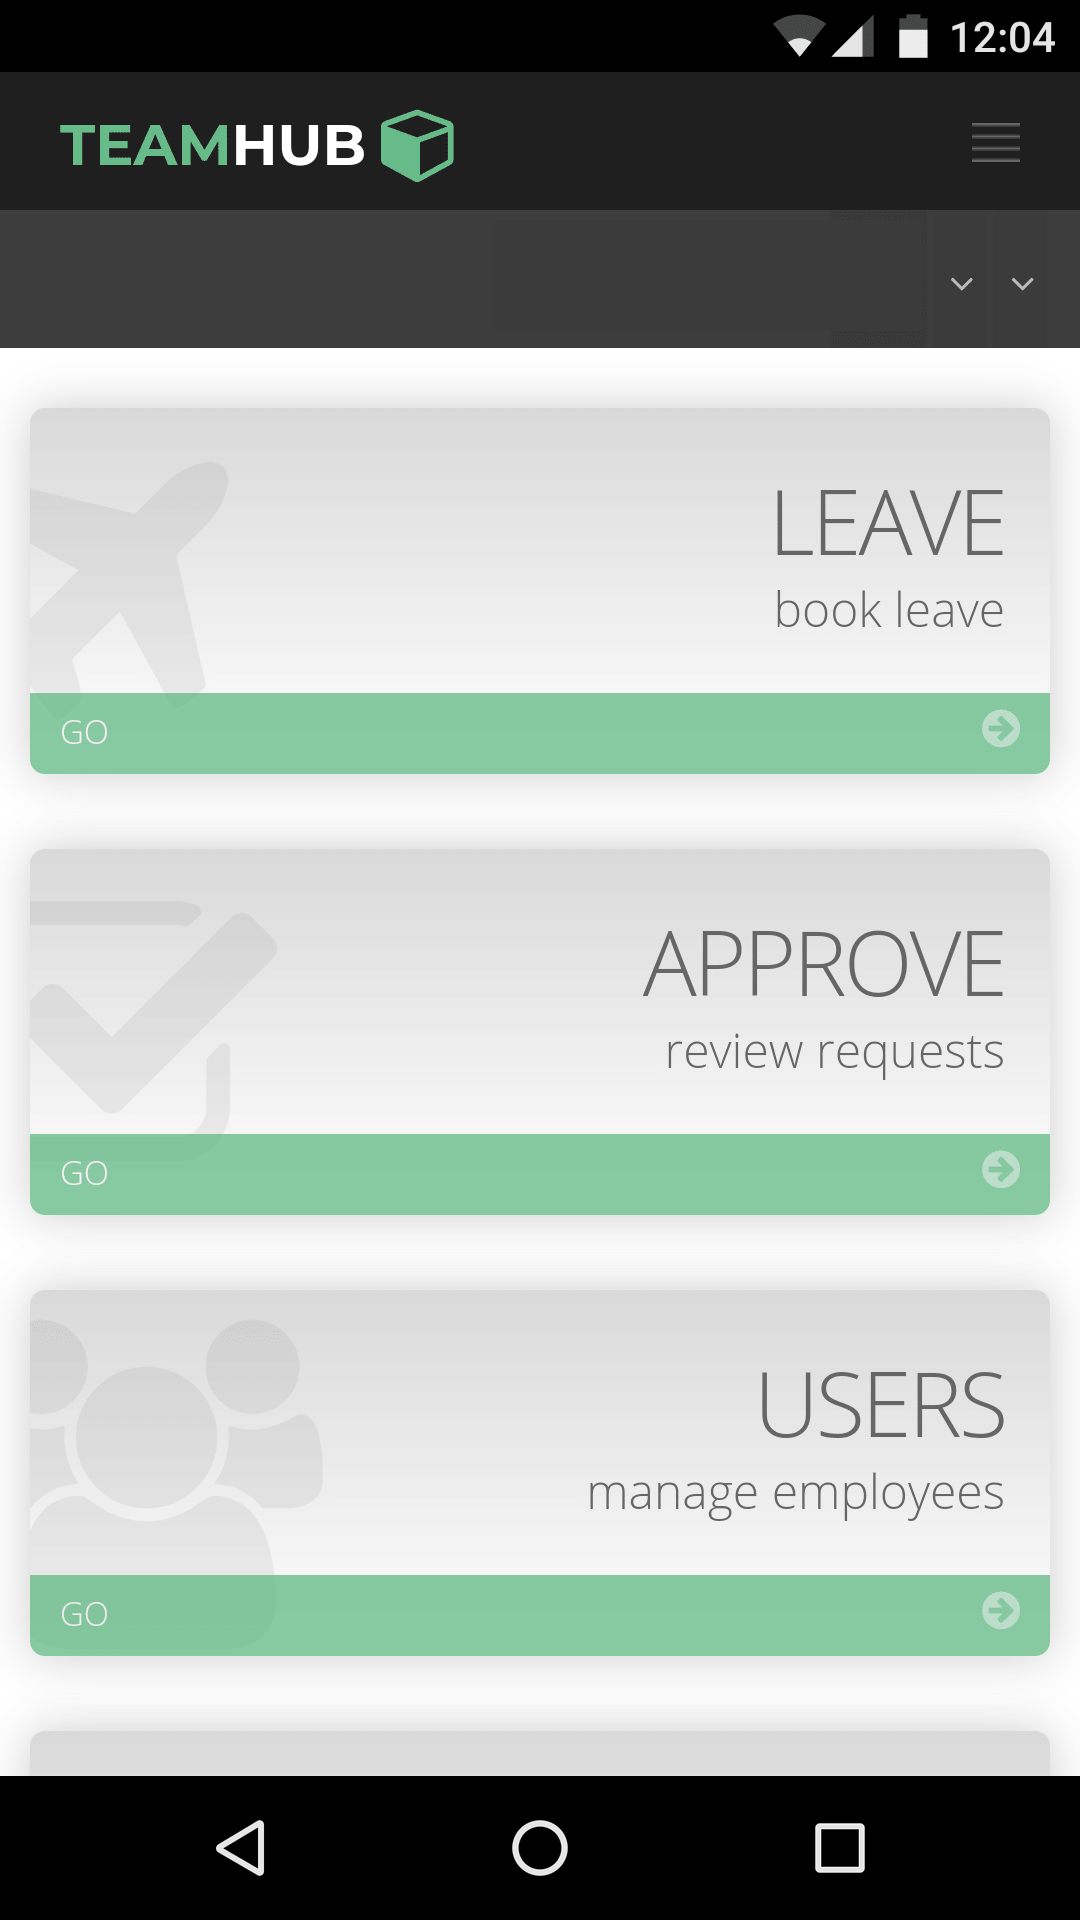 Mobile App — TeamHub 1 0 5 documentation